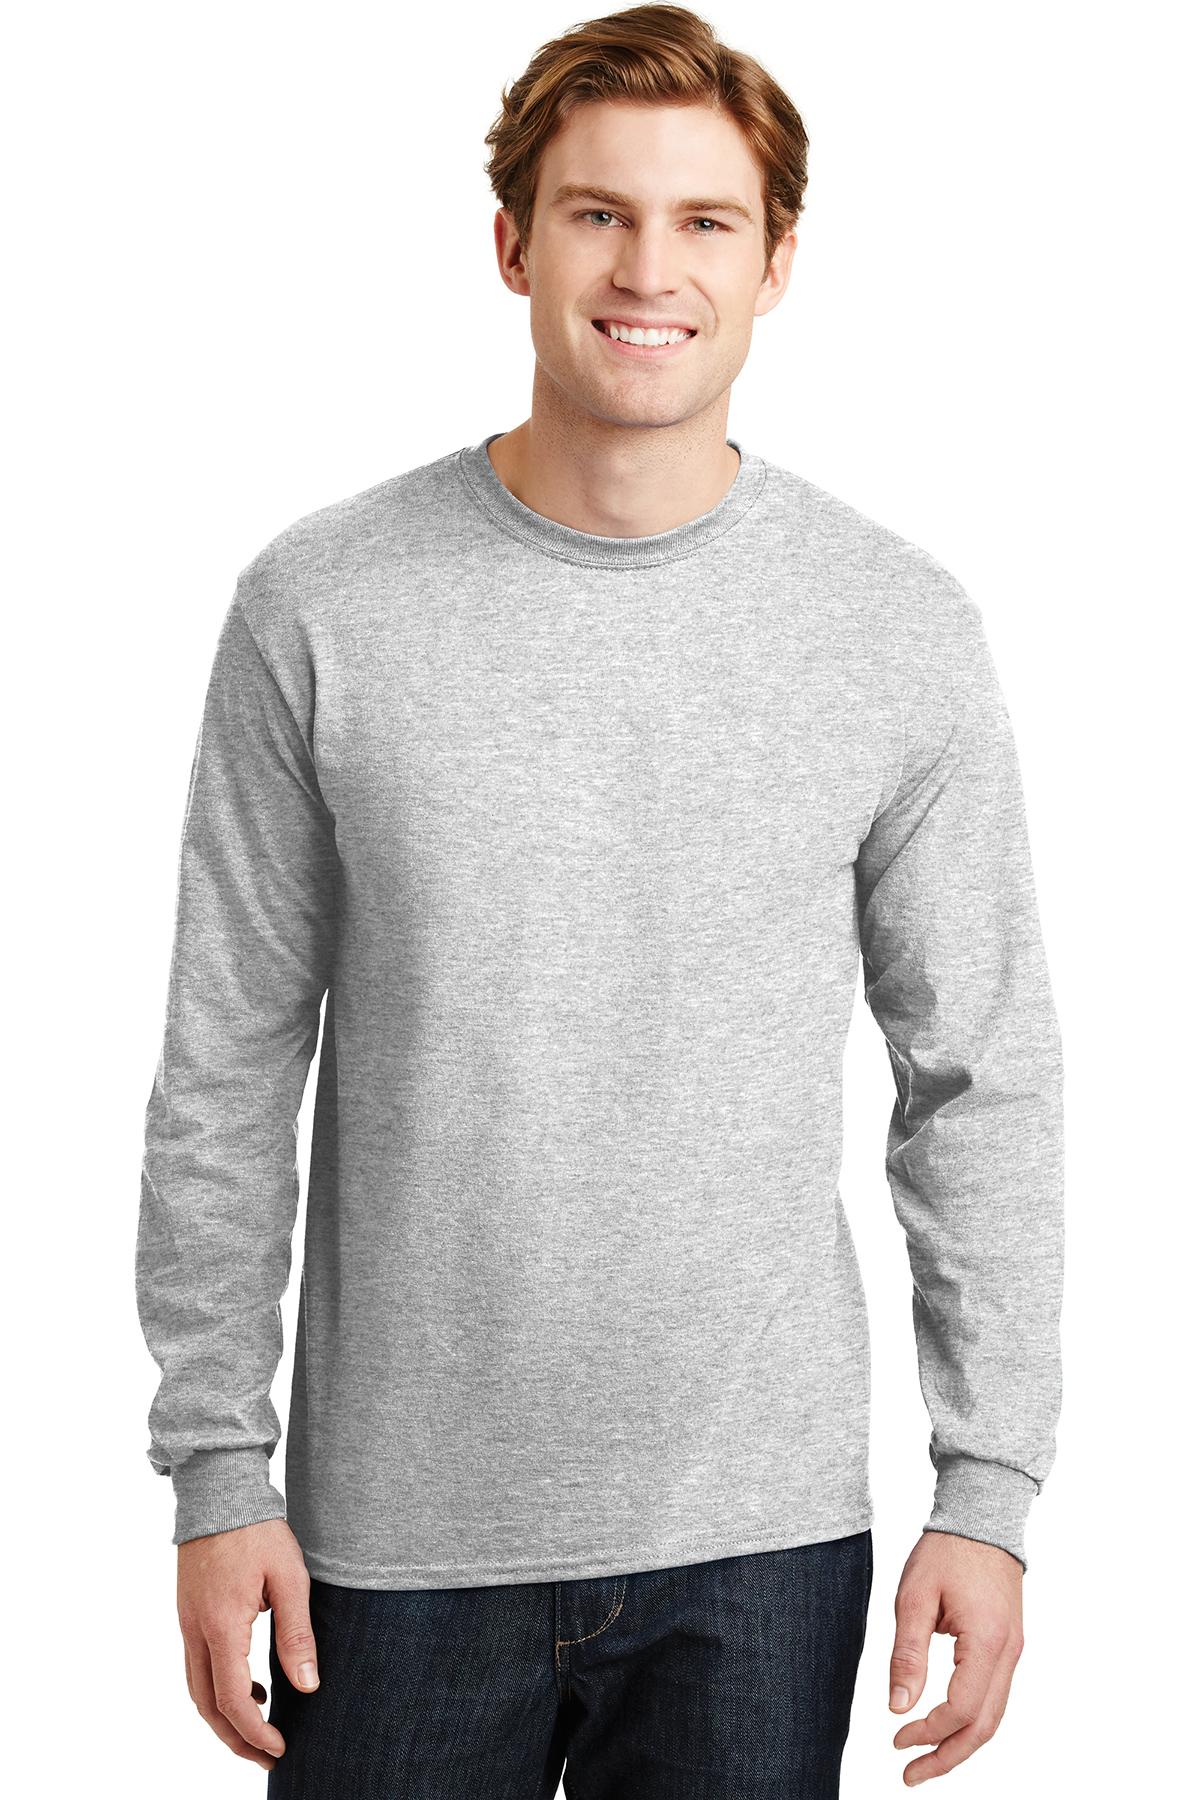 8829ad77a83 Gildan® - DryBlend® 50 Cotton/50 Poly Long Sleeve T-Shirt | 50/50 ...